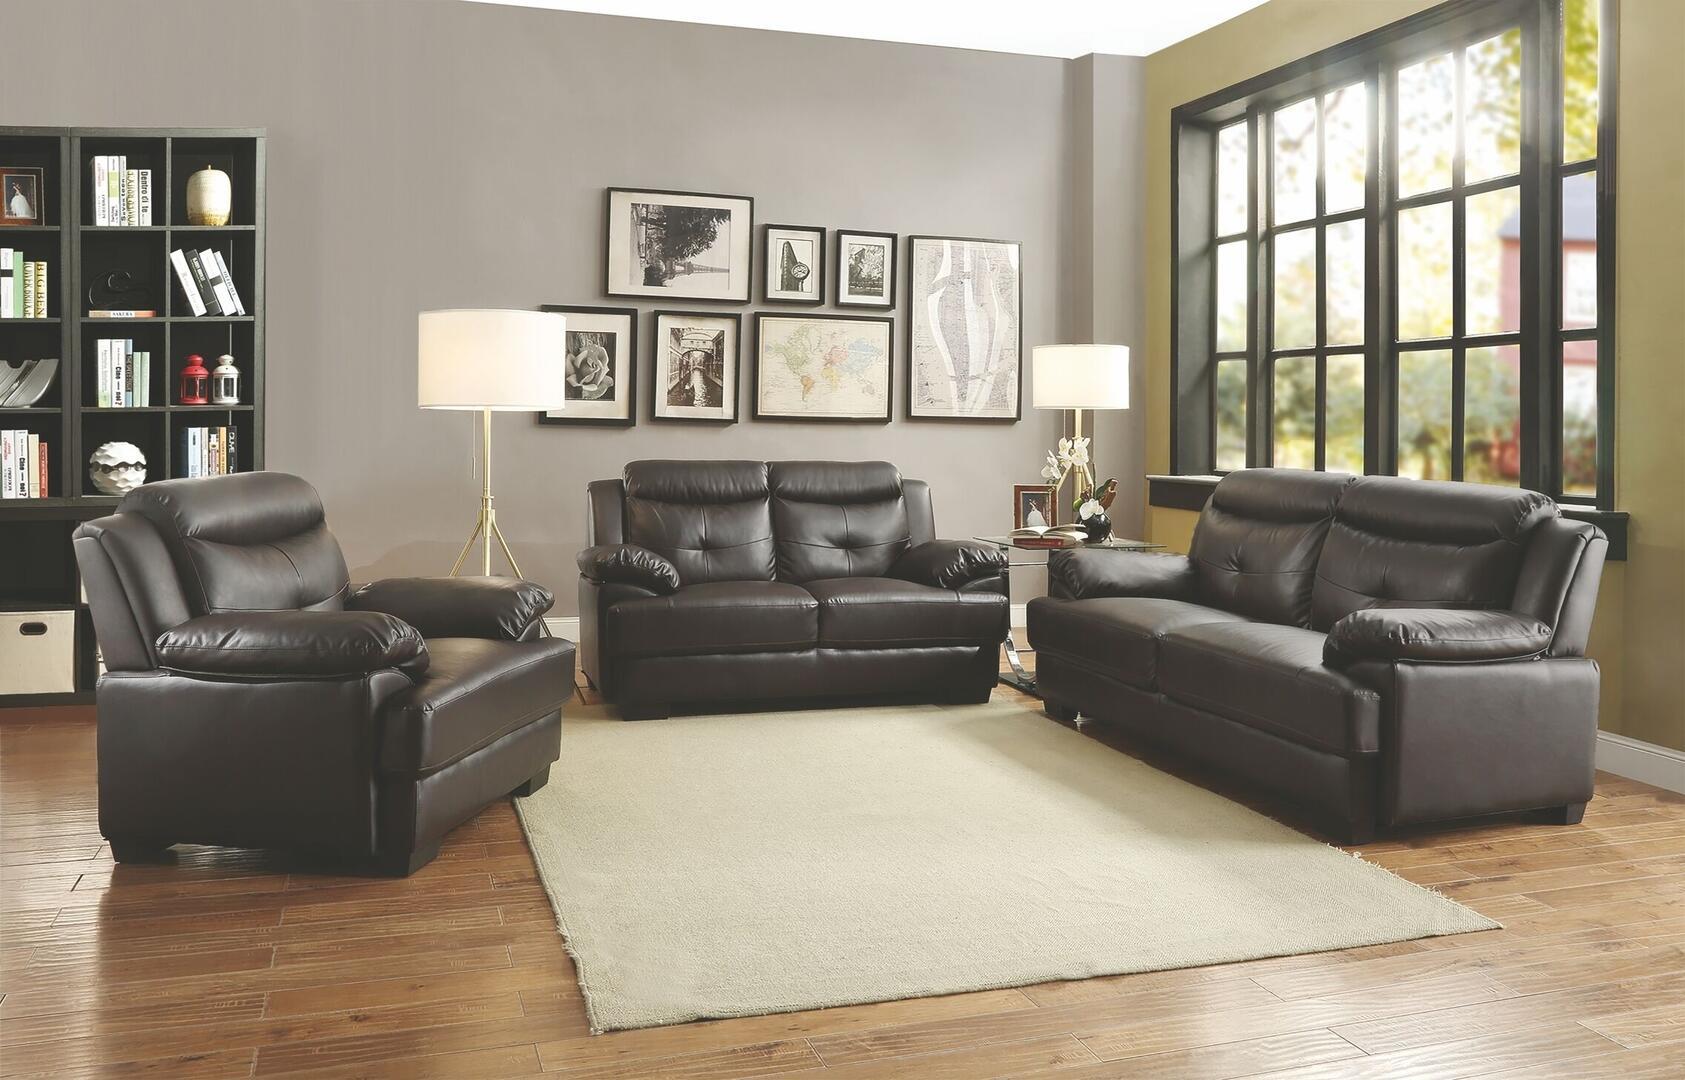 Glory furniture g488set g480 living room sets appliances for Living room of satoshi tax